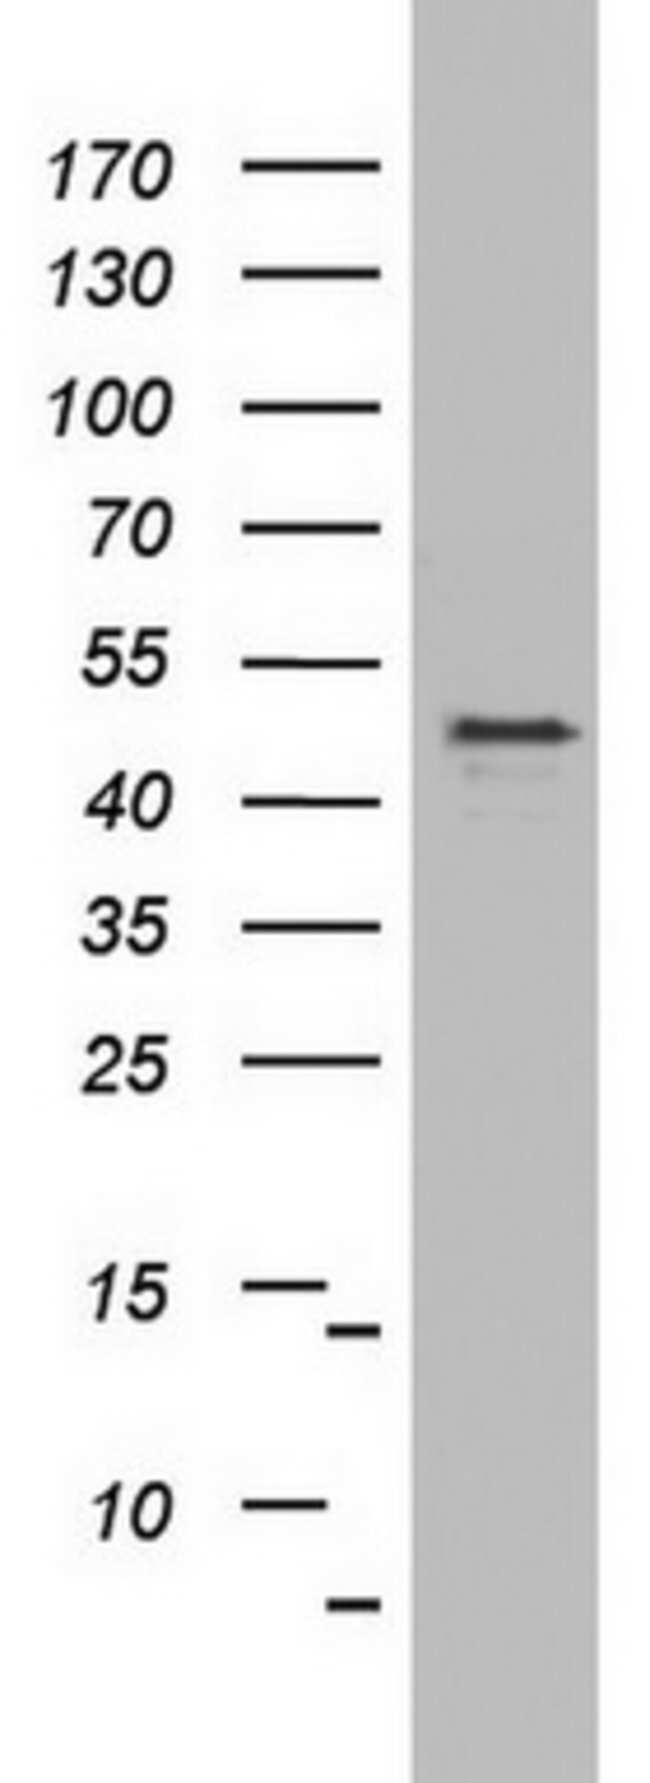 OXSM Mouse anti-Human, Clone: OTI4E10, lyophilized, TrueMAB  100 µg;